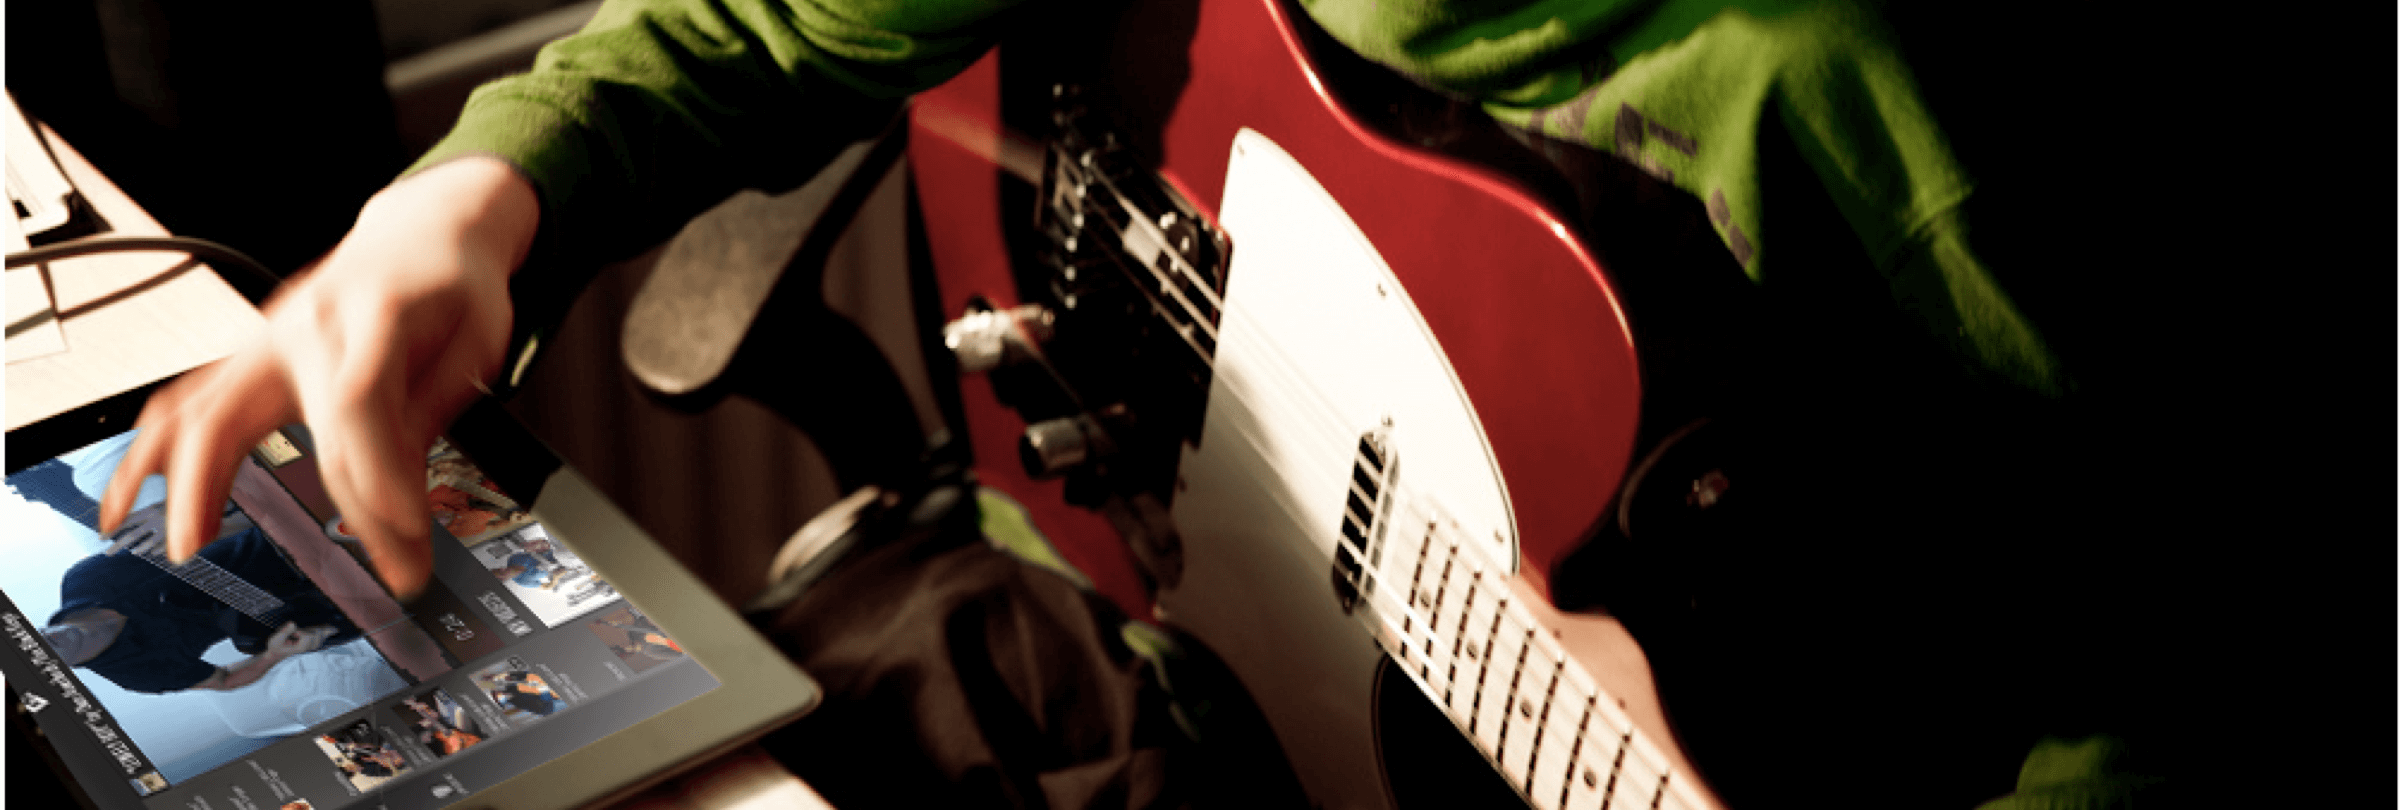 guitarmy-hero